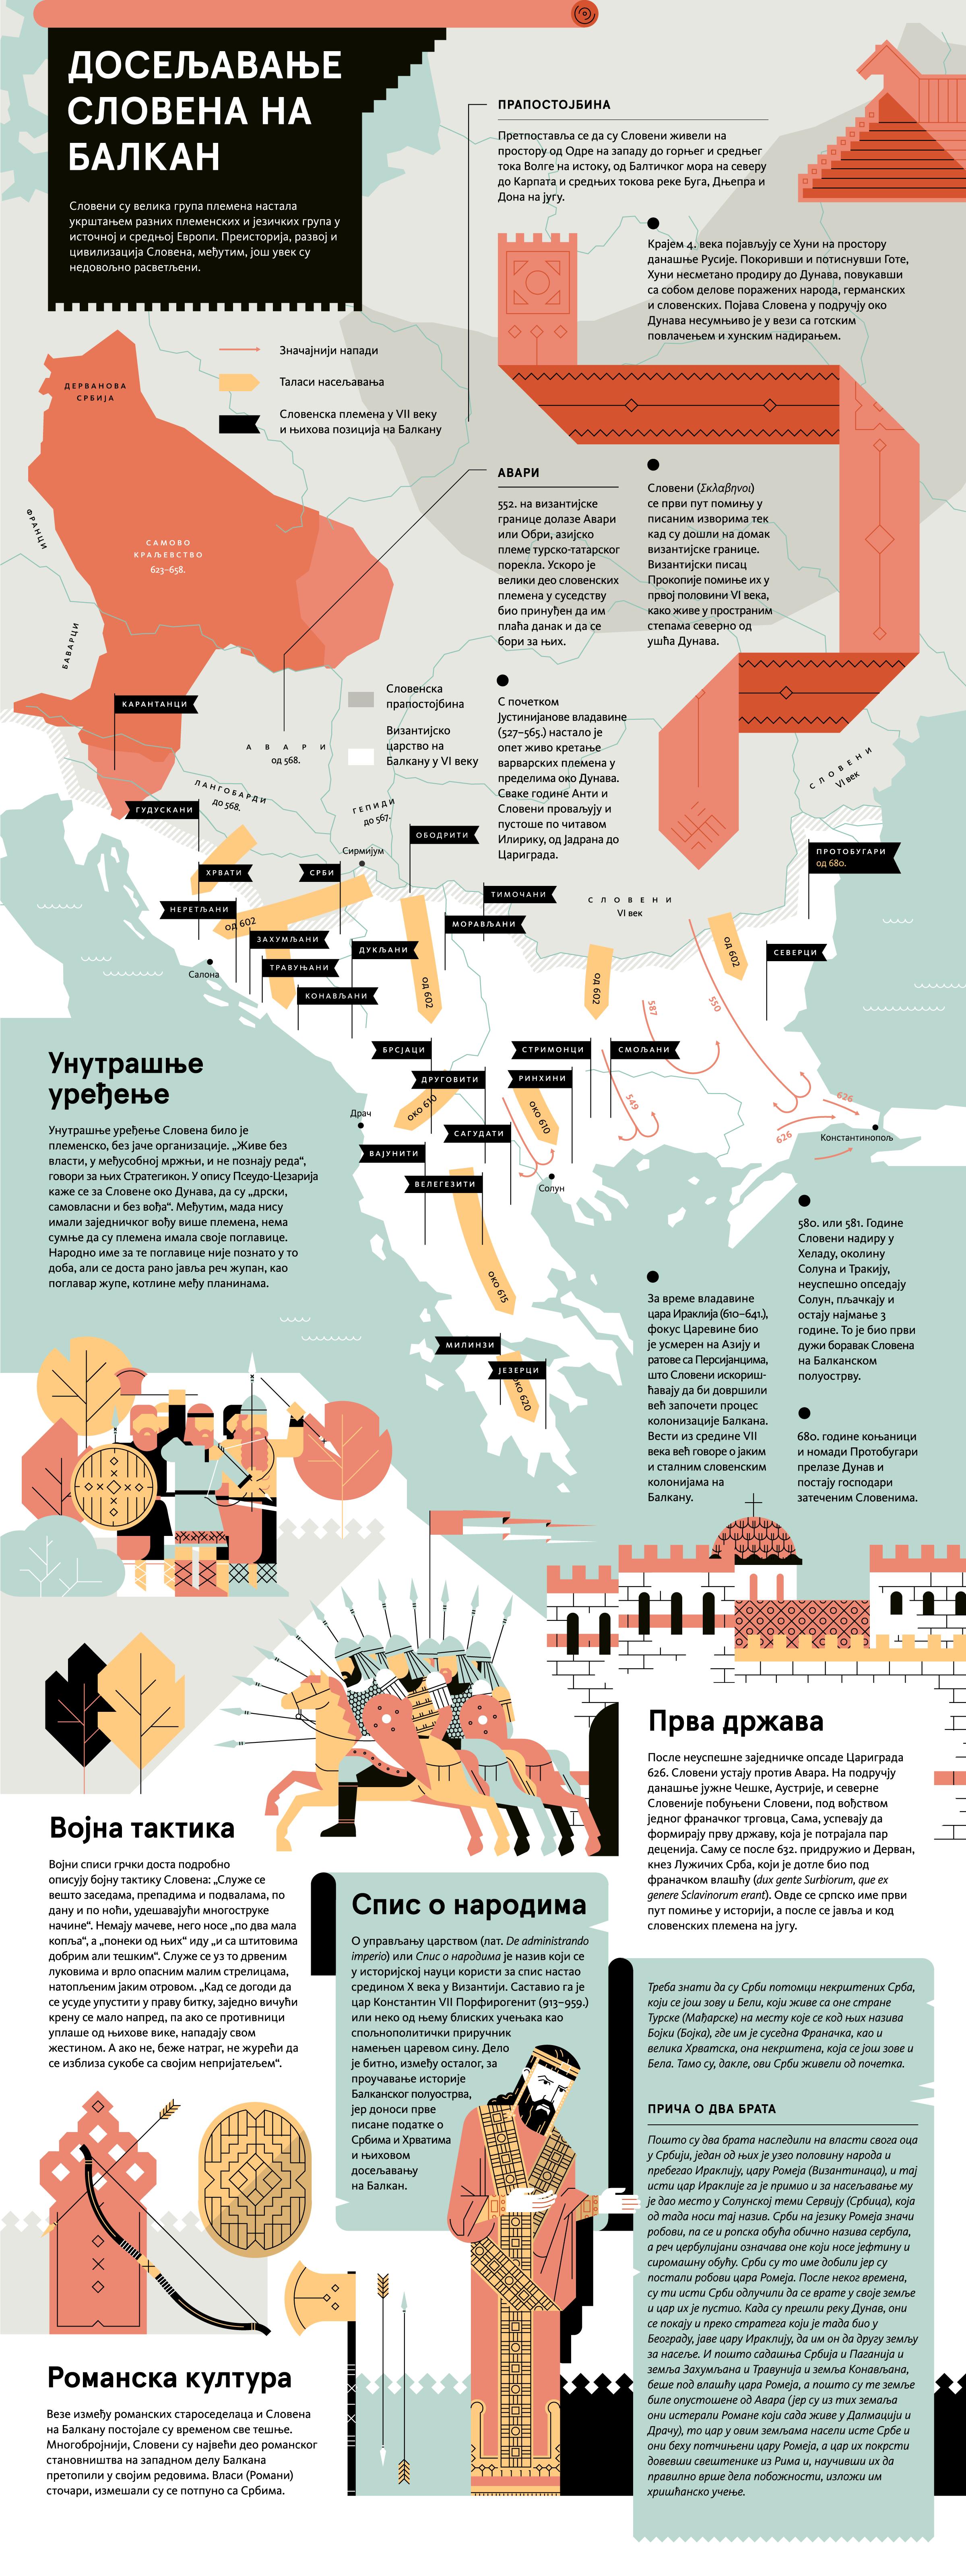 aleksandar-savic_cps_infographic-slavic-migrations4